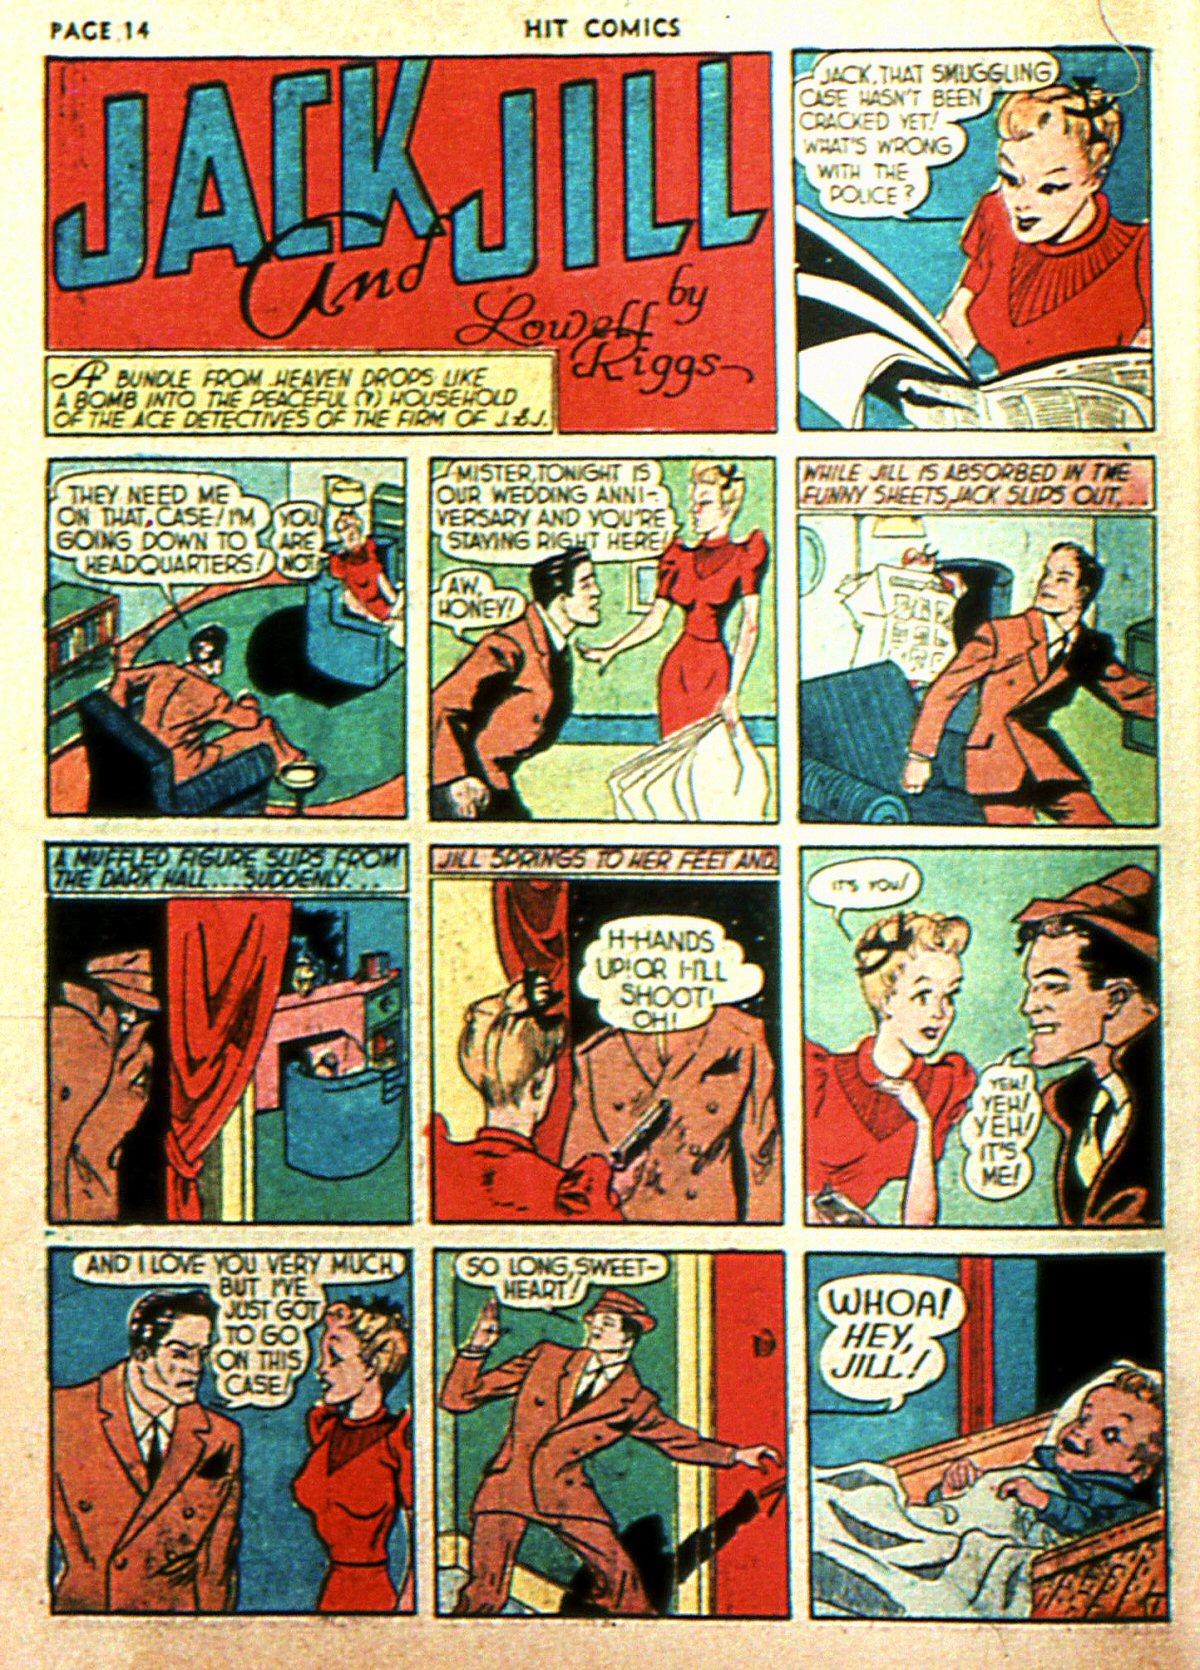 Read online Hit Comics comic -  Issue #2 - 16